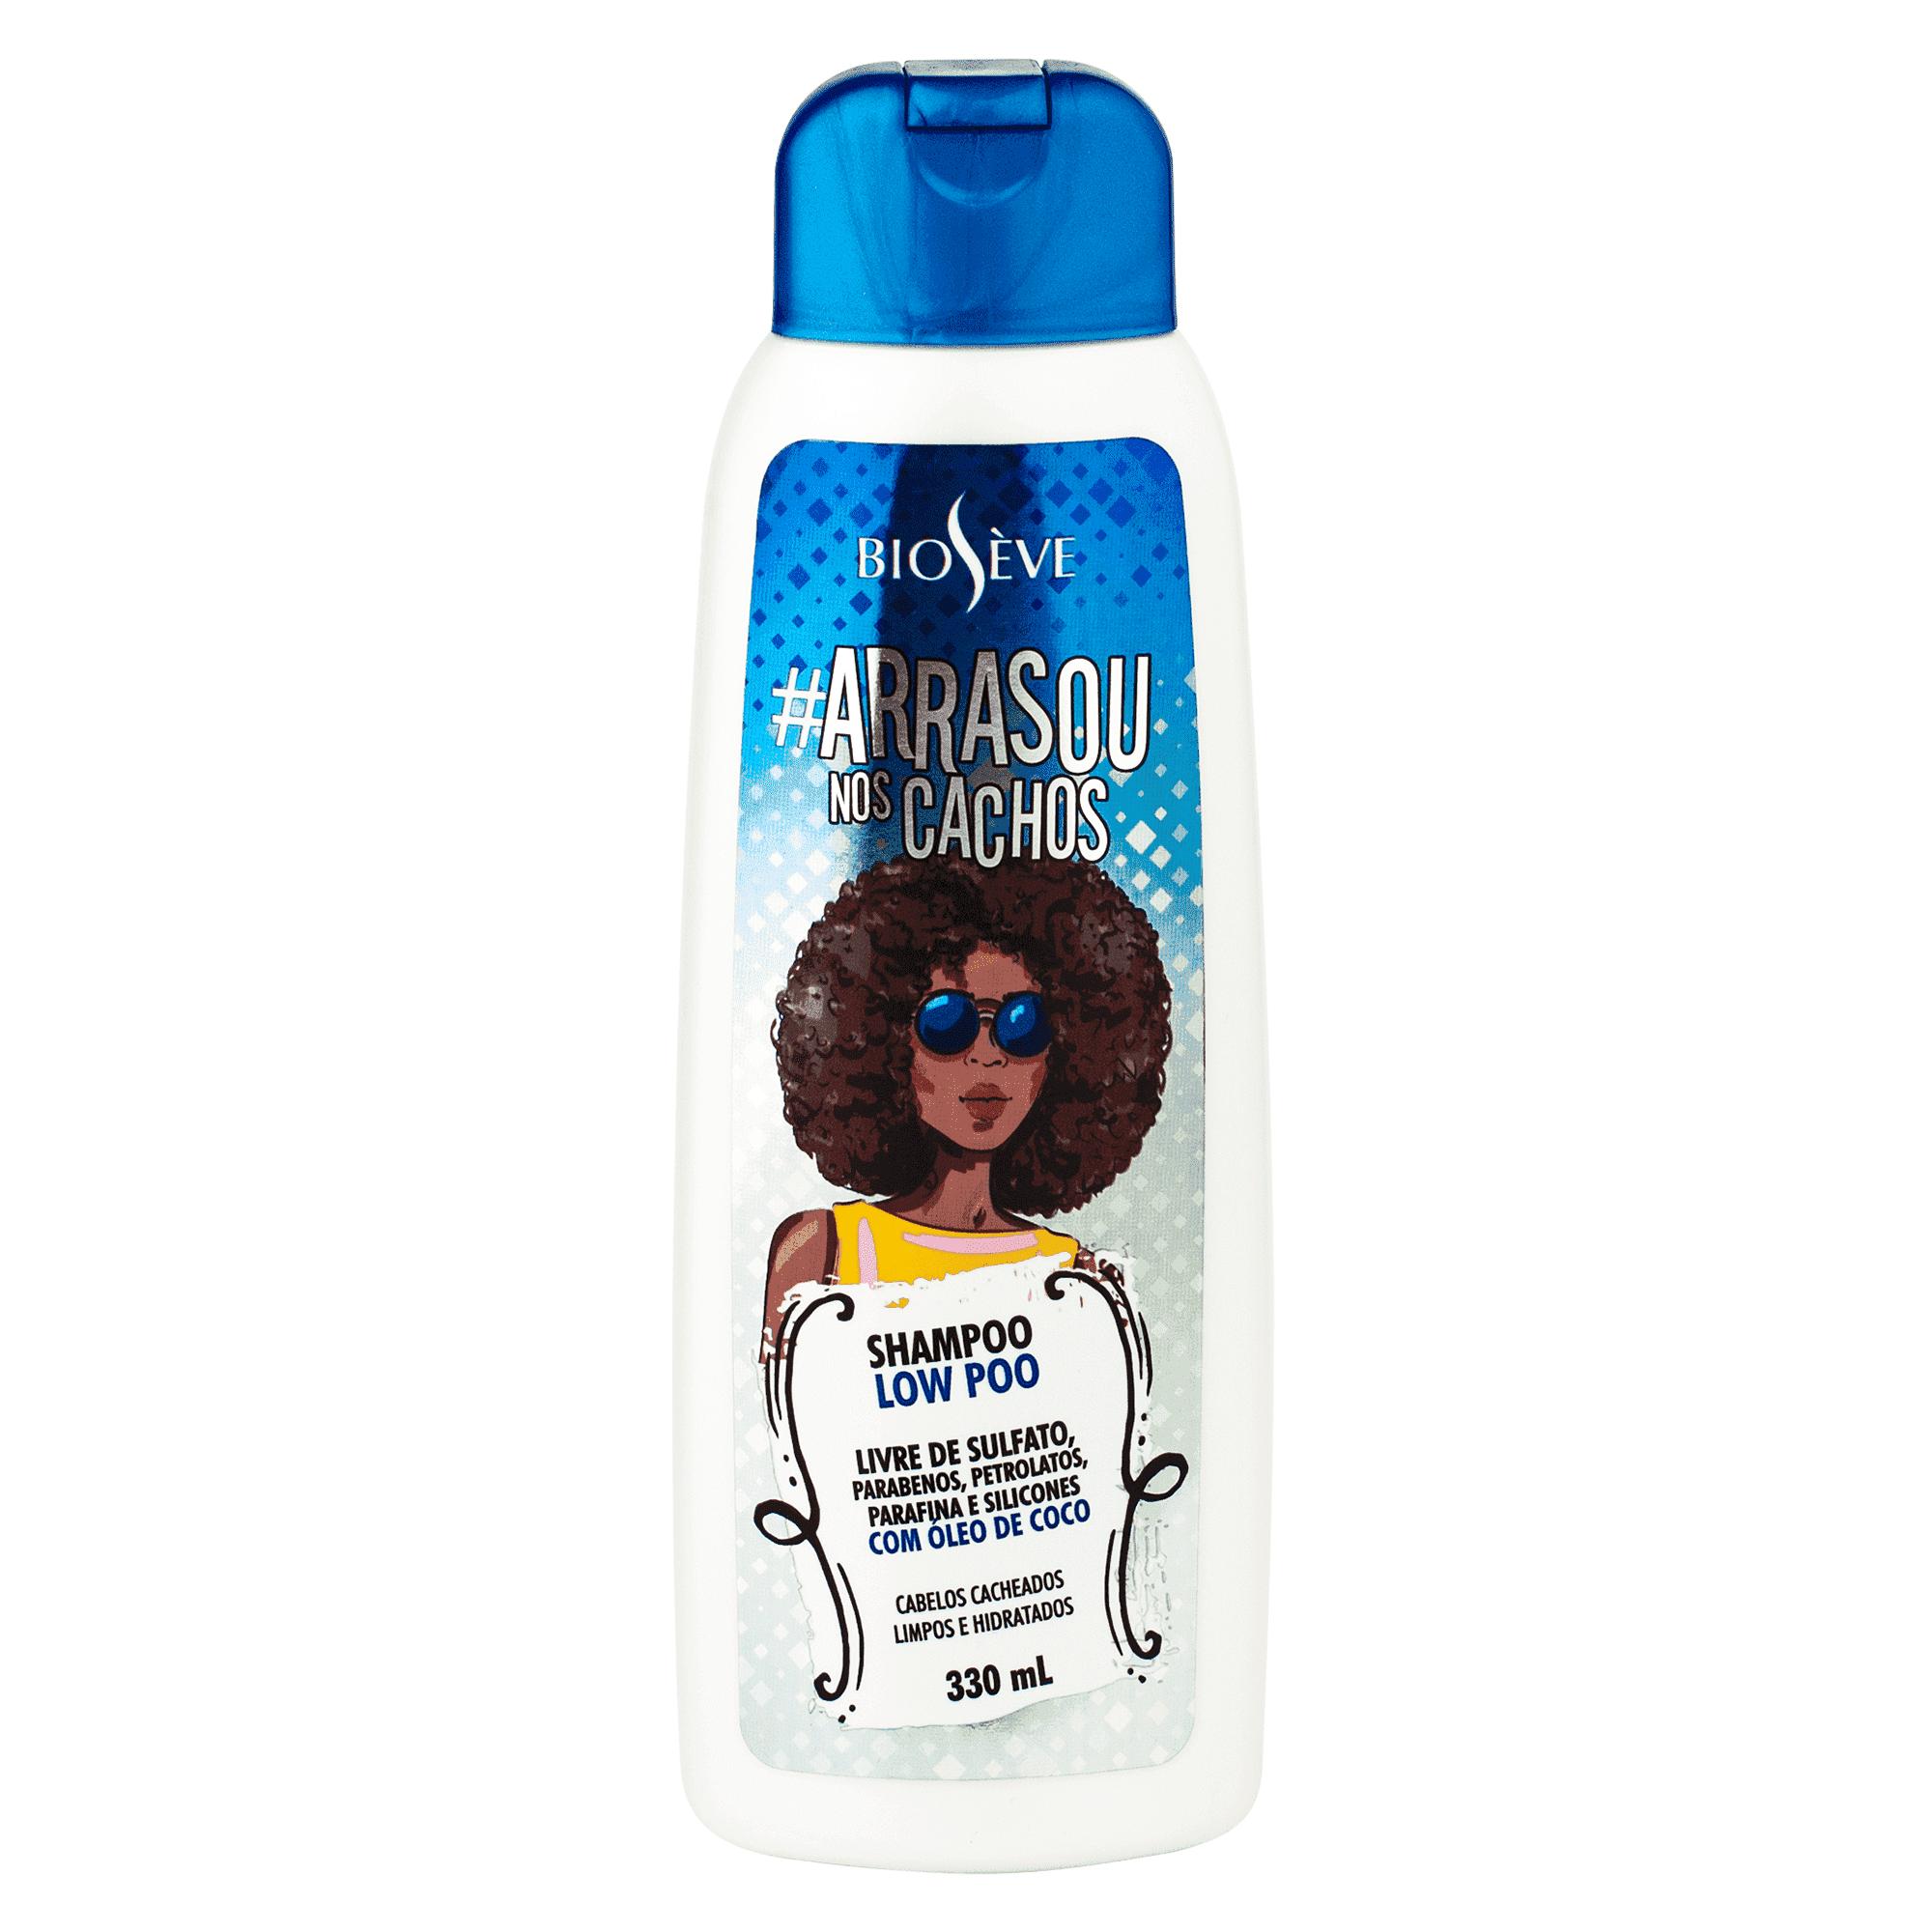 Shampoo Low Poo Arrasou Nos Cachos Bioseve 330ml